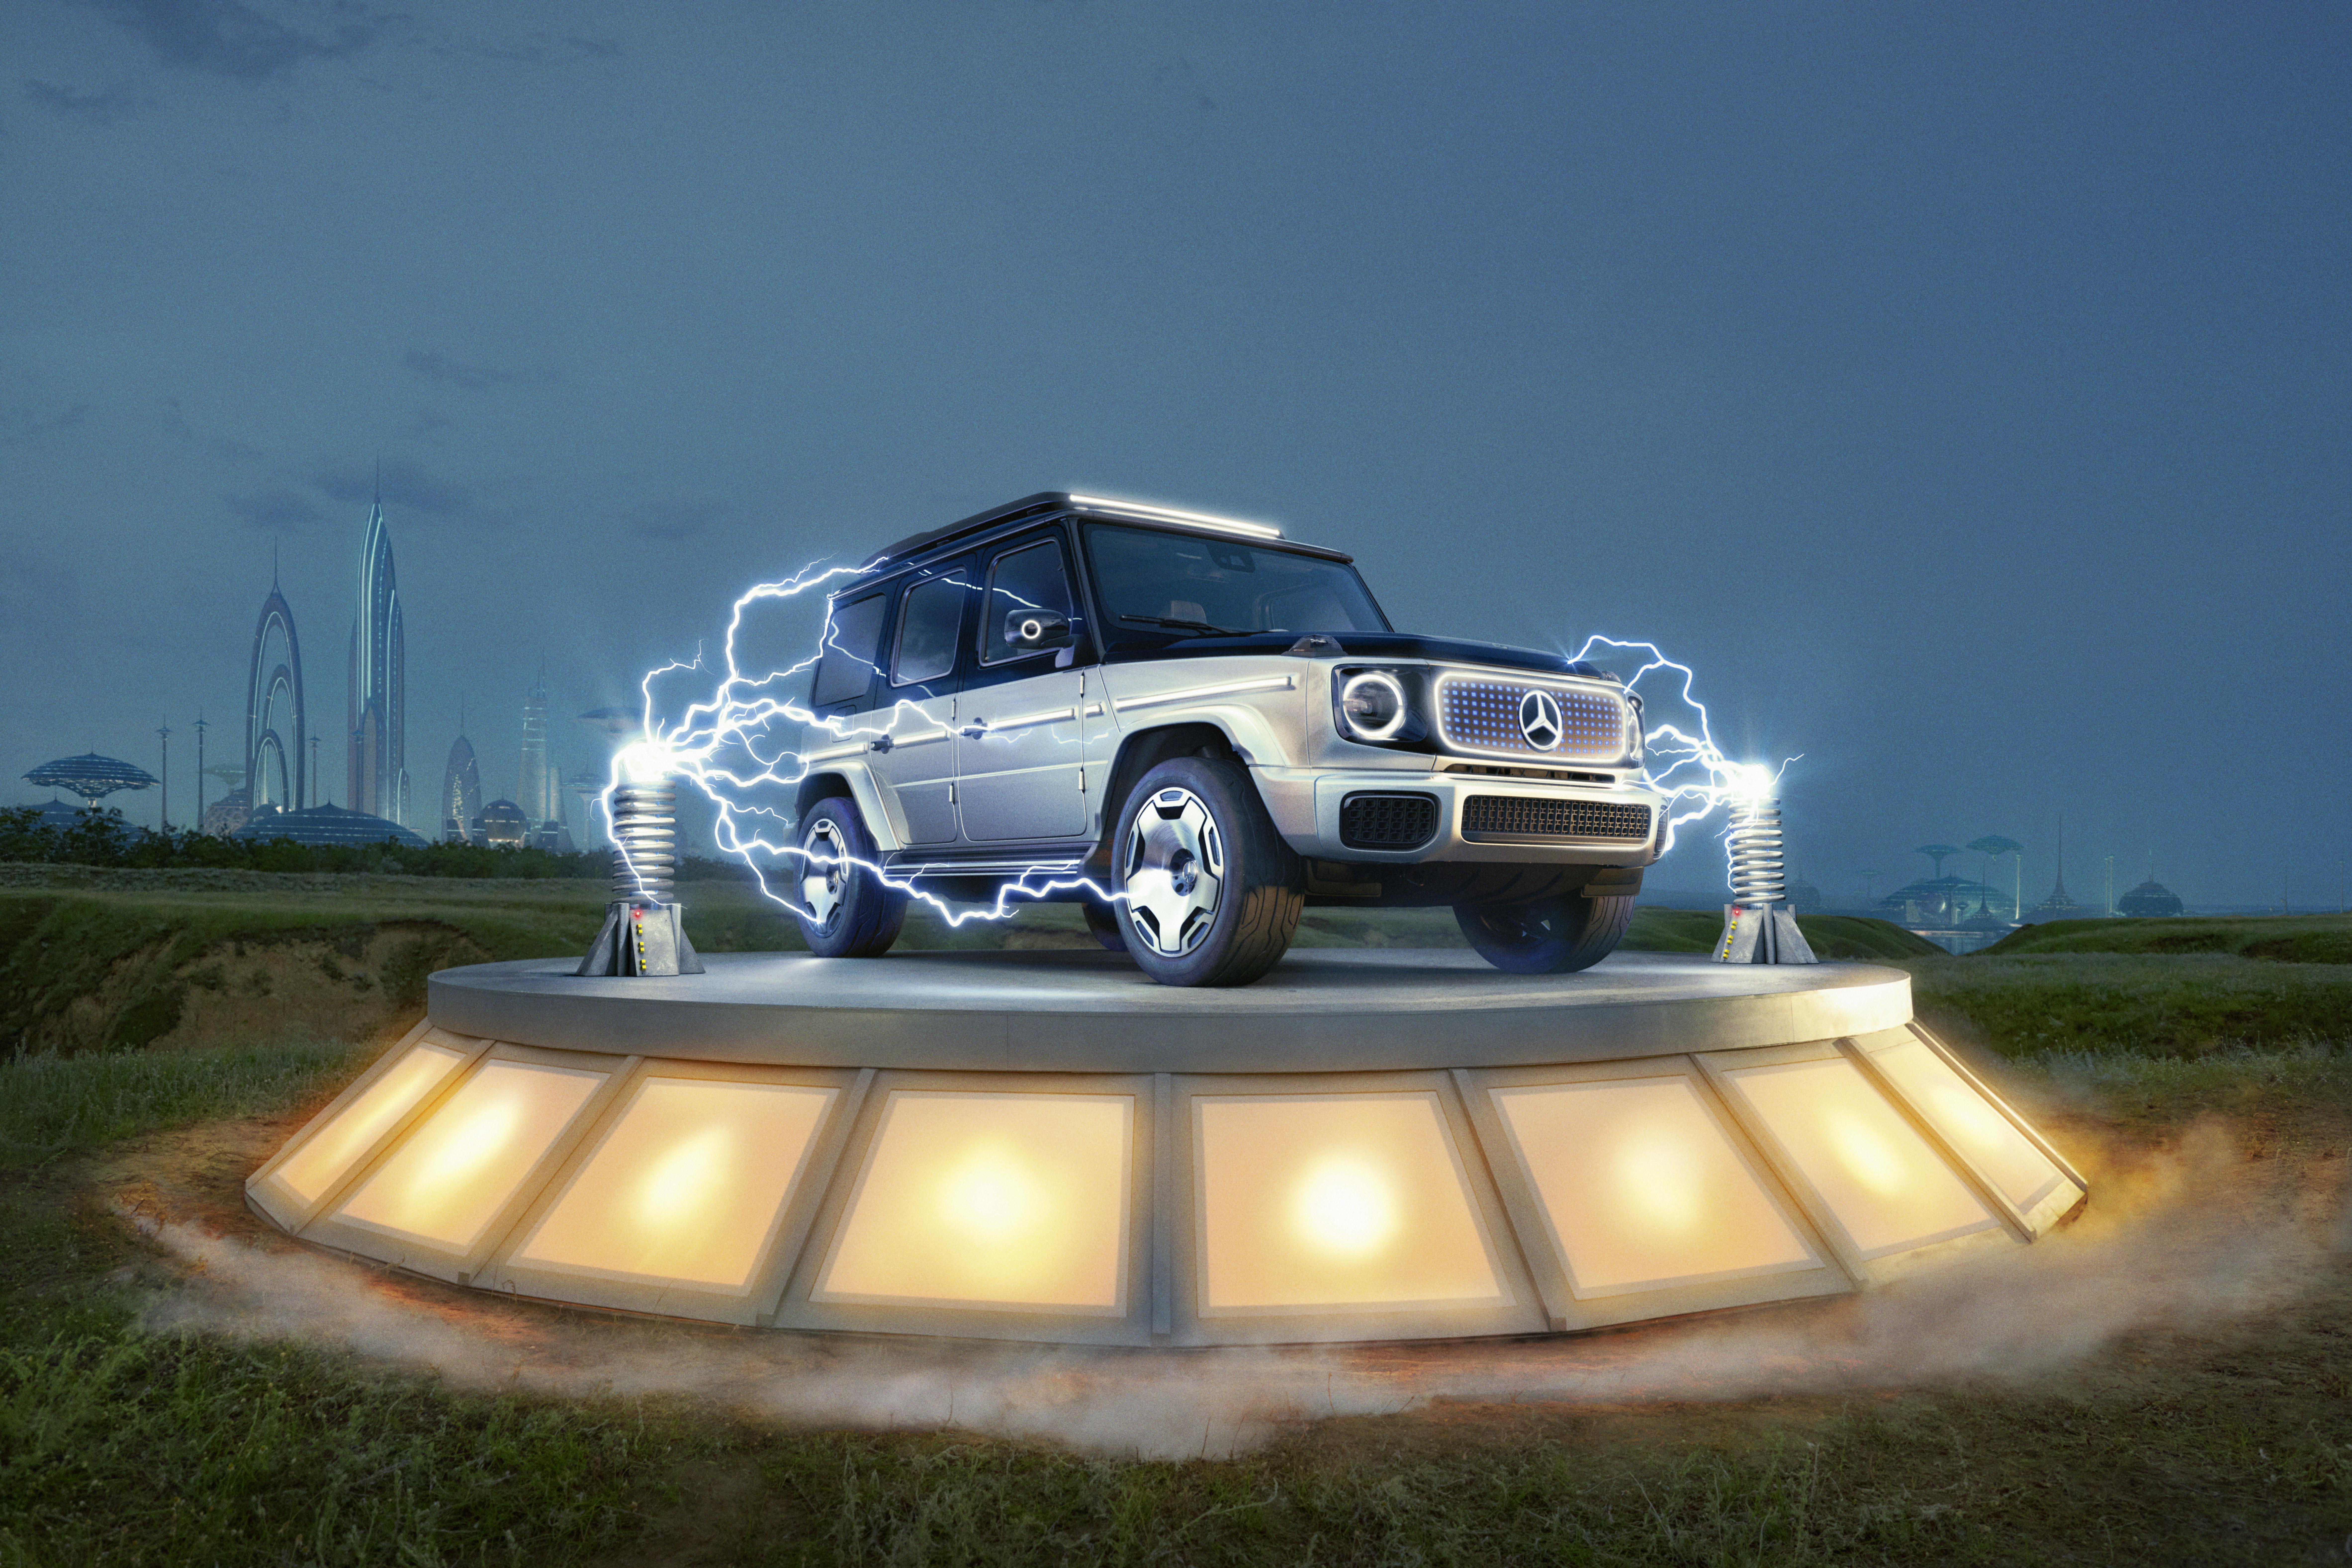 Mercedes showcases also electric SUVs at IAA